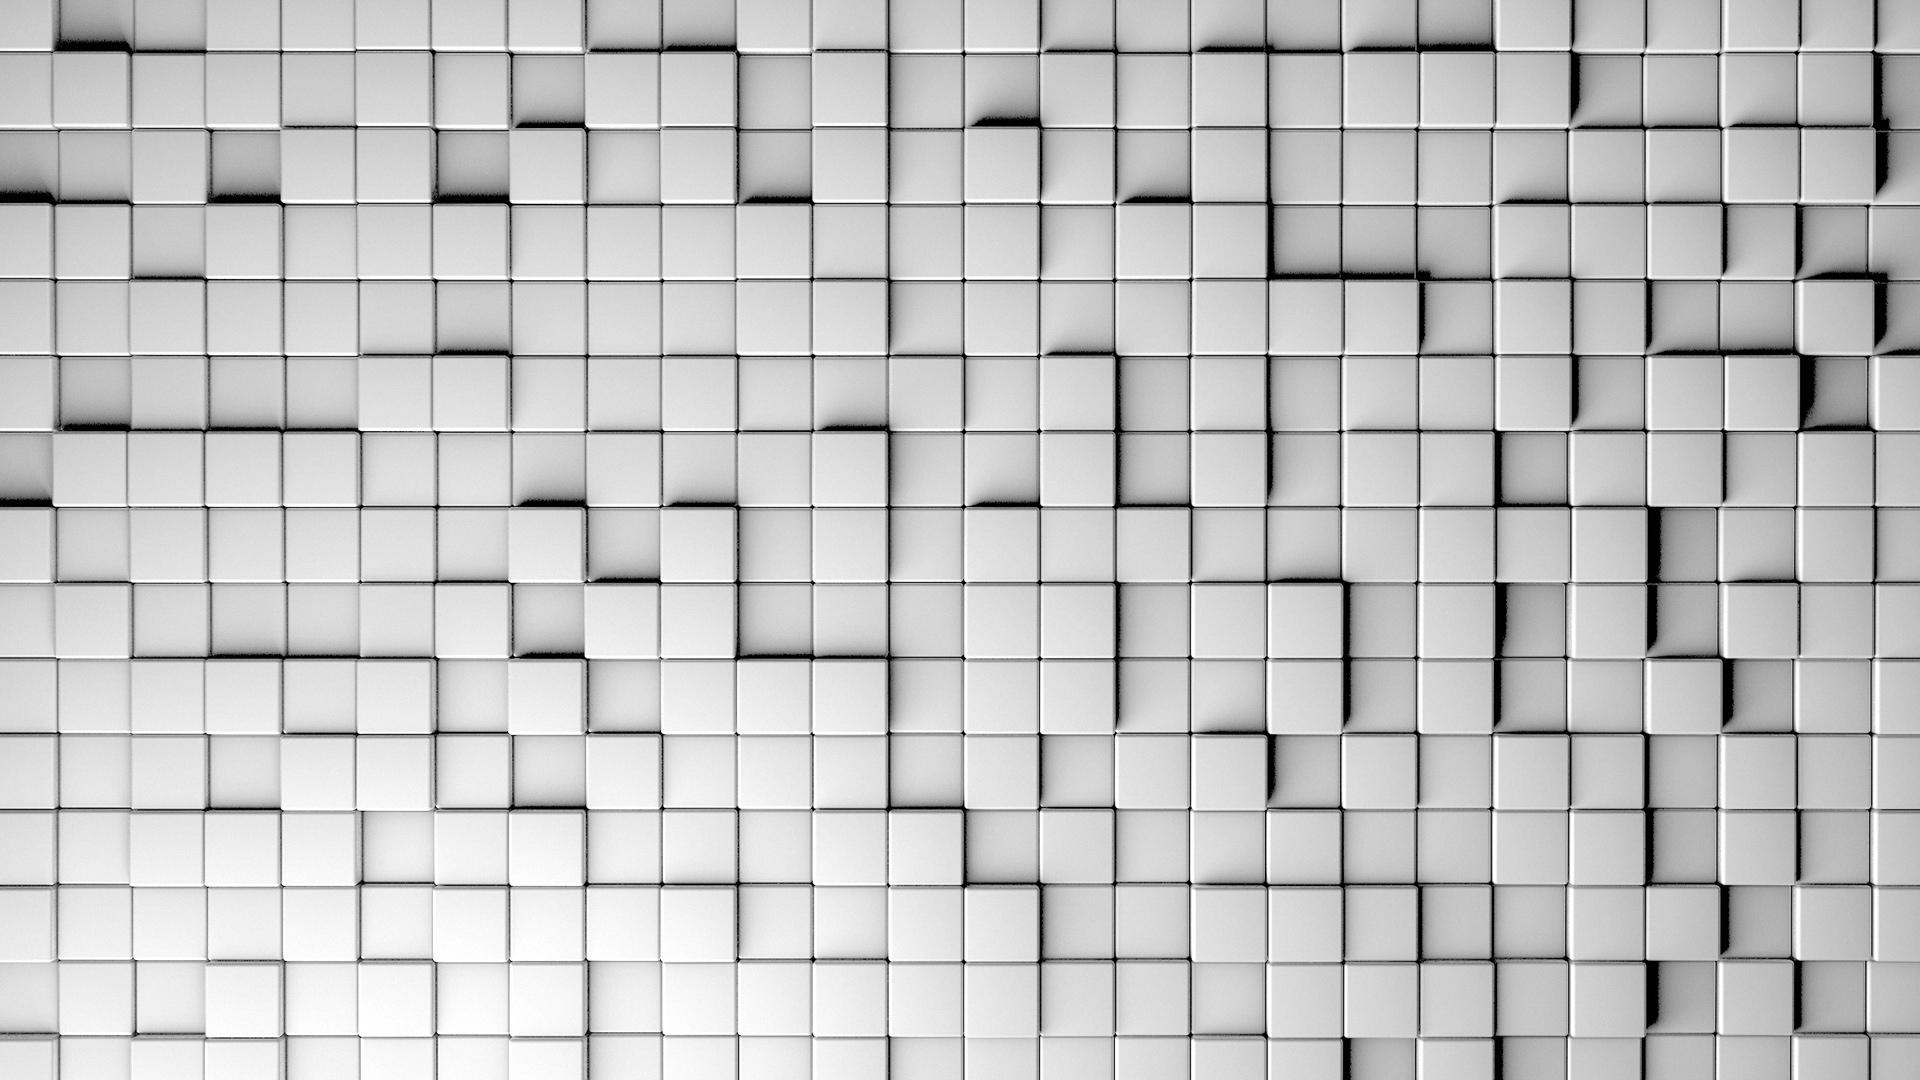 White-Wallpaper-22-2 – Jinxbot 3D Printing